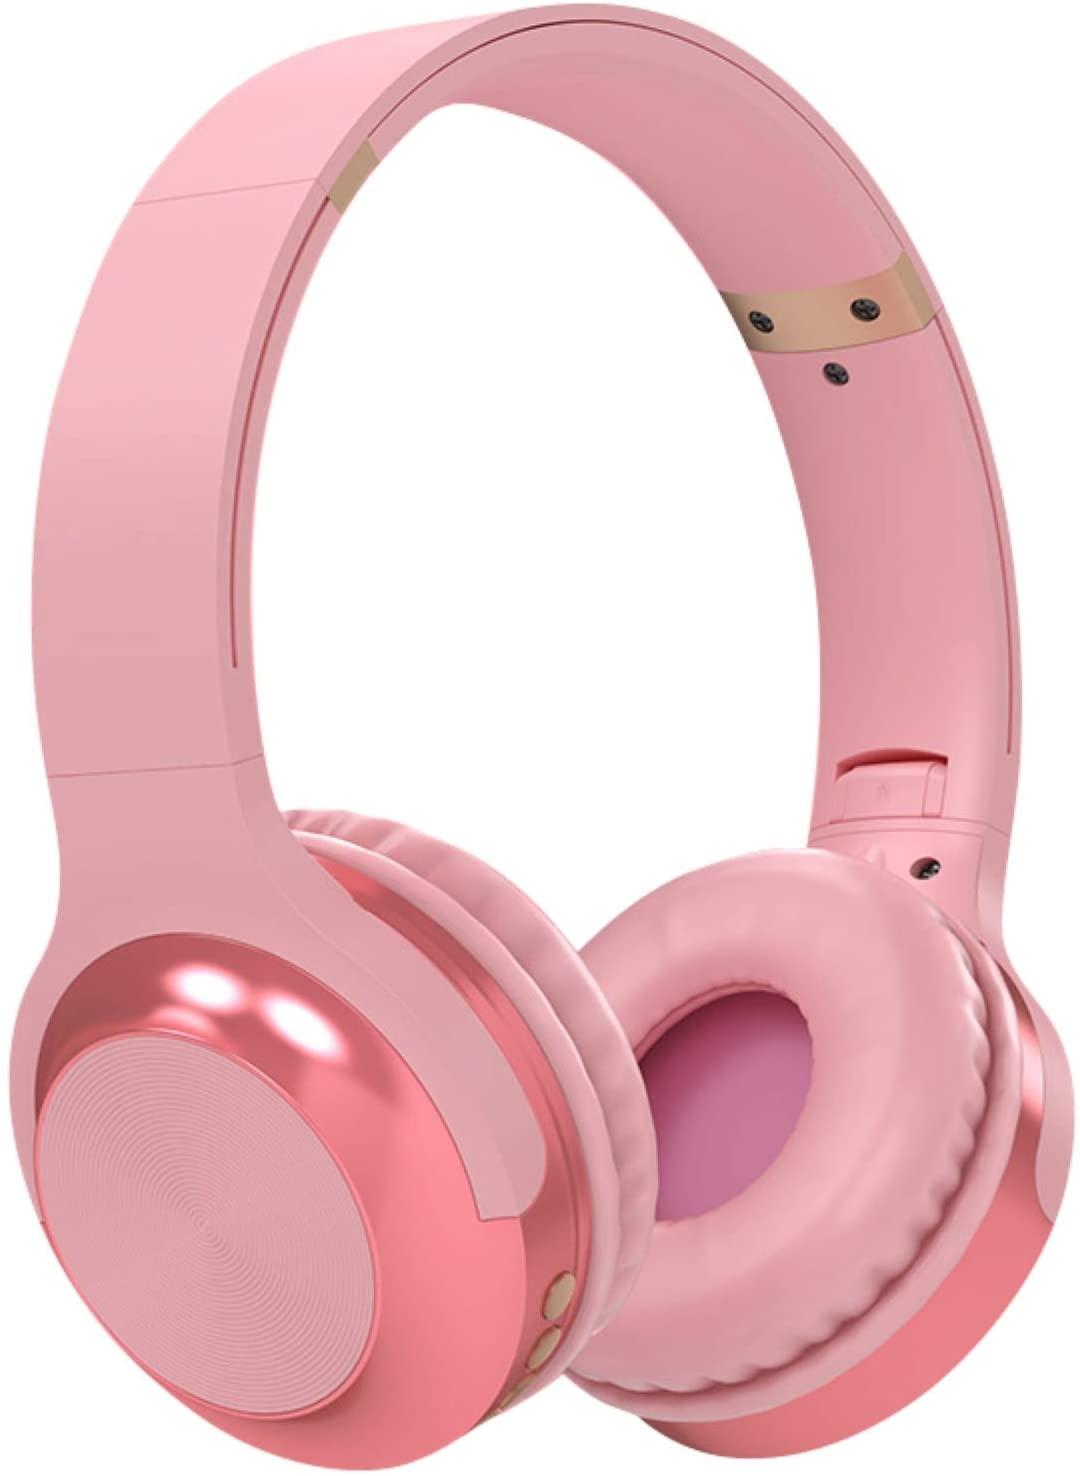 MOHALIKO Bluetooth Headphones, Wireless Headphones, A10 Head-Mounted Bluetooth Headset Stereo Wireless Card Radio Universal Earphone for School Home or Travel Pink